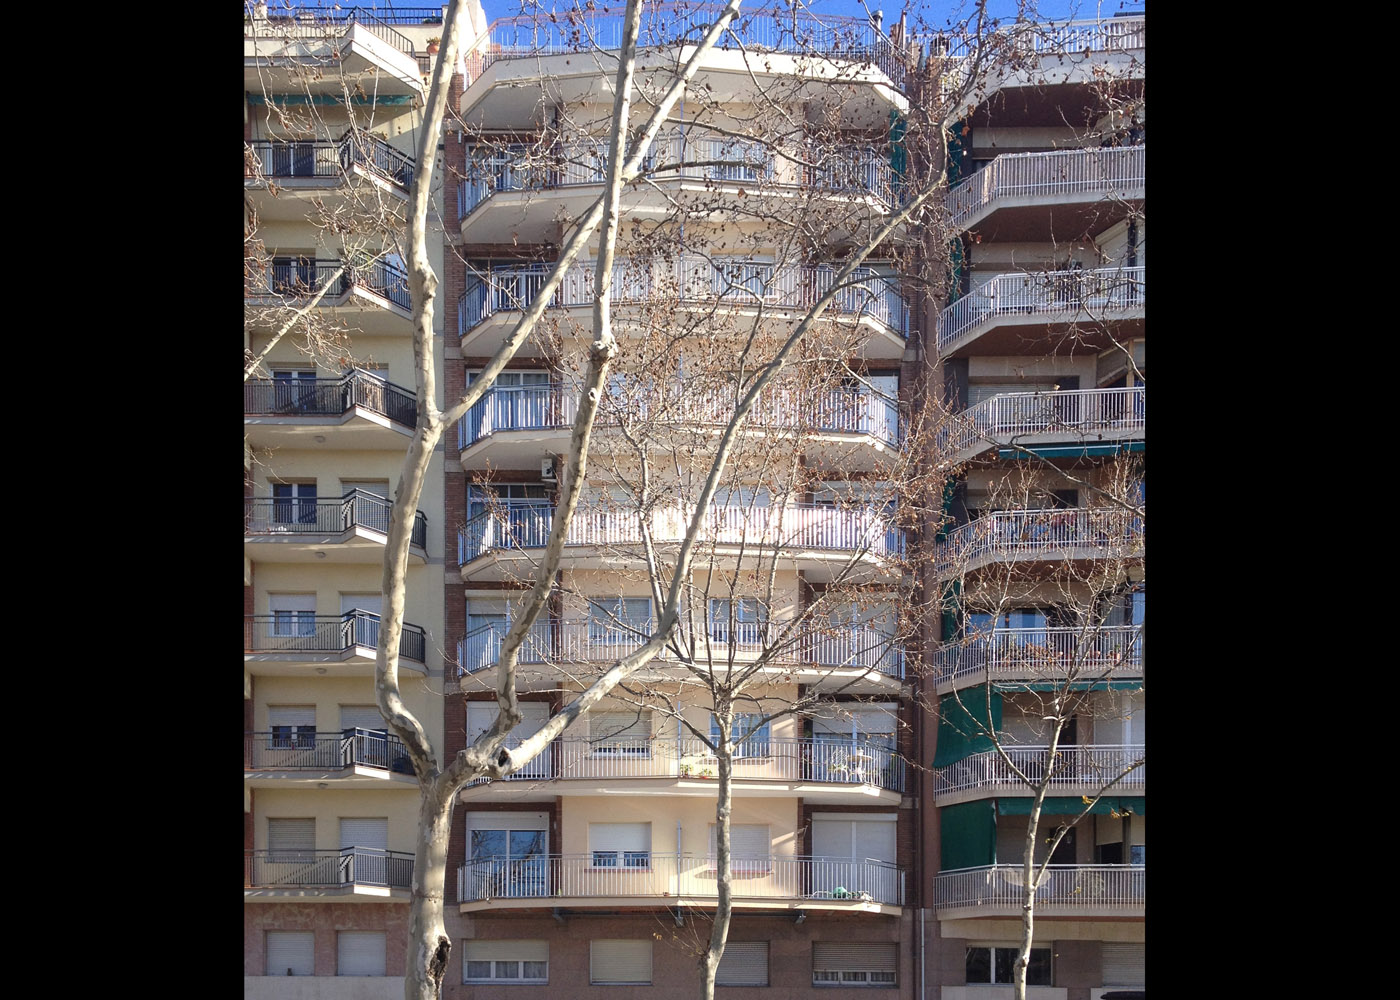 rehabilitacion-vivienda-plurifamiliar-passeig-de-lluis-companys-6-barcelona-03